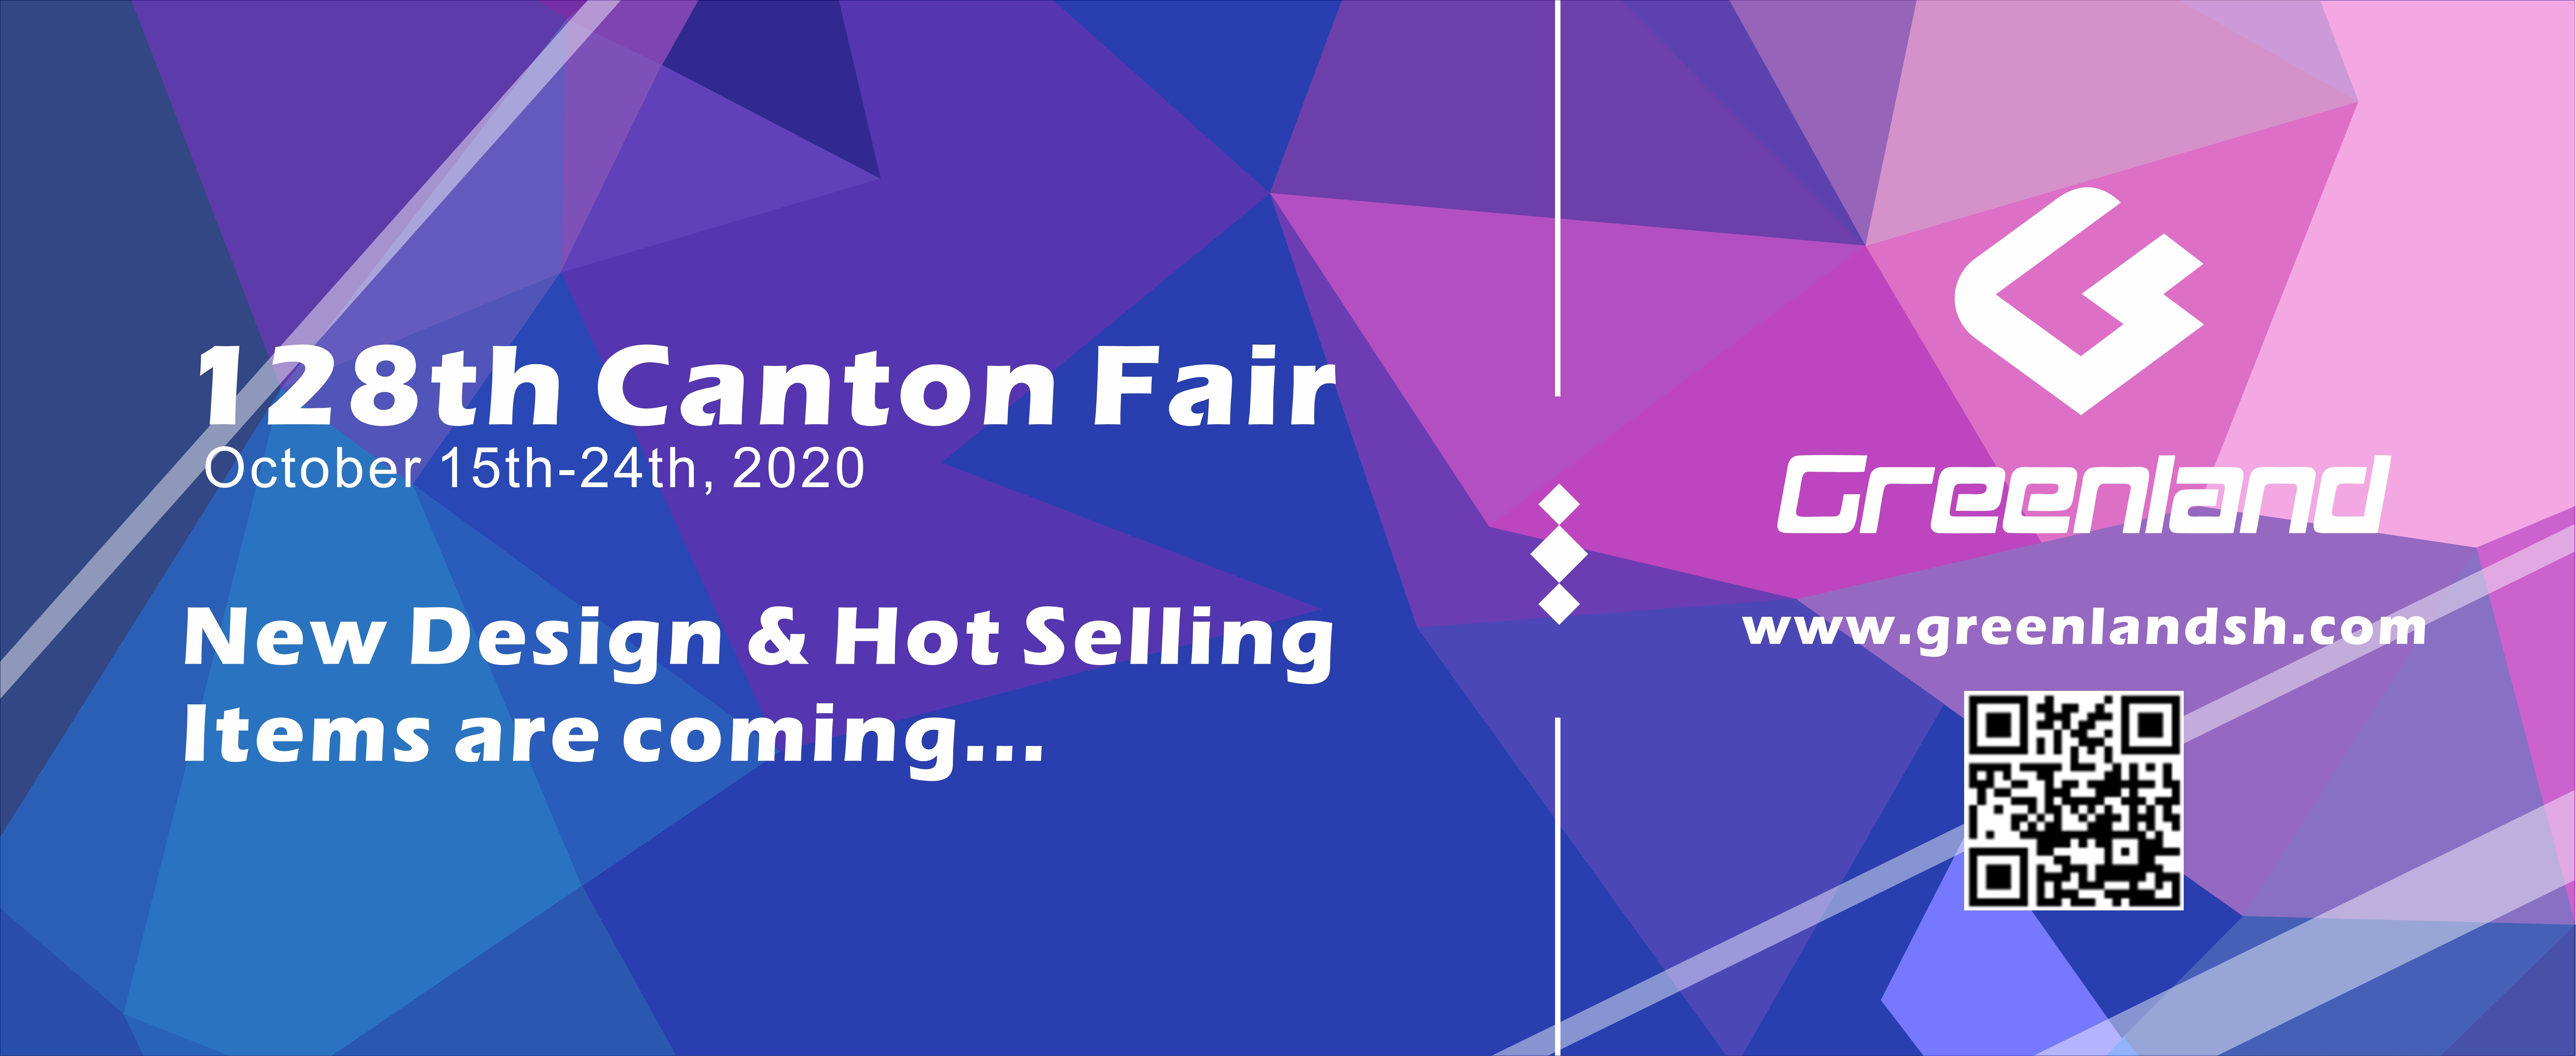 128th Canton Fair online:October 15th-24th,2020